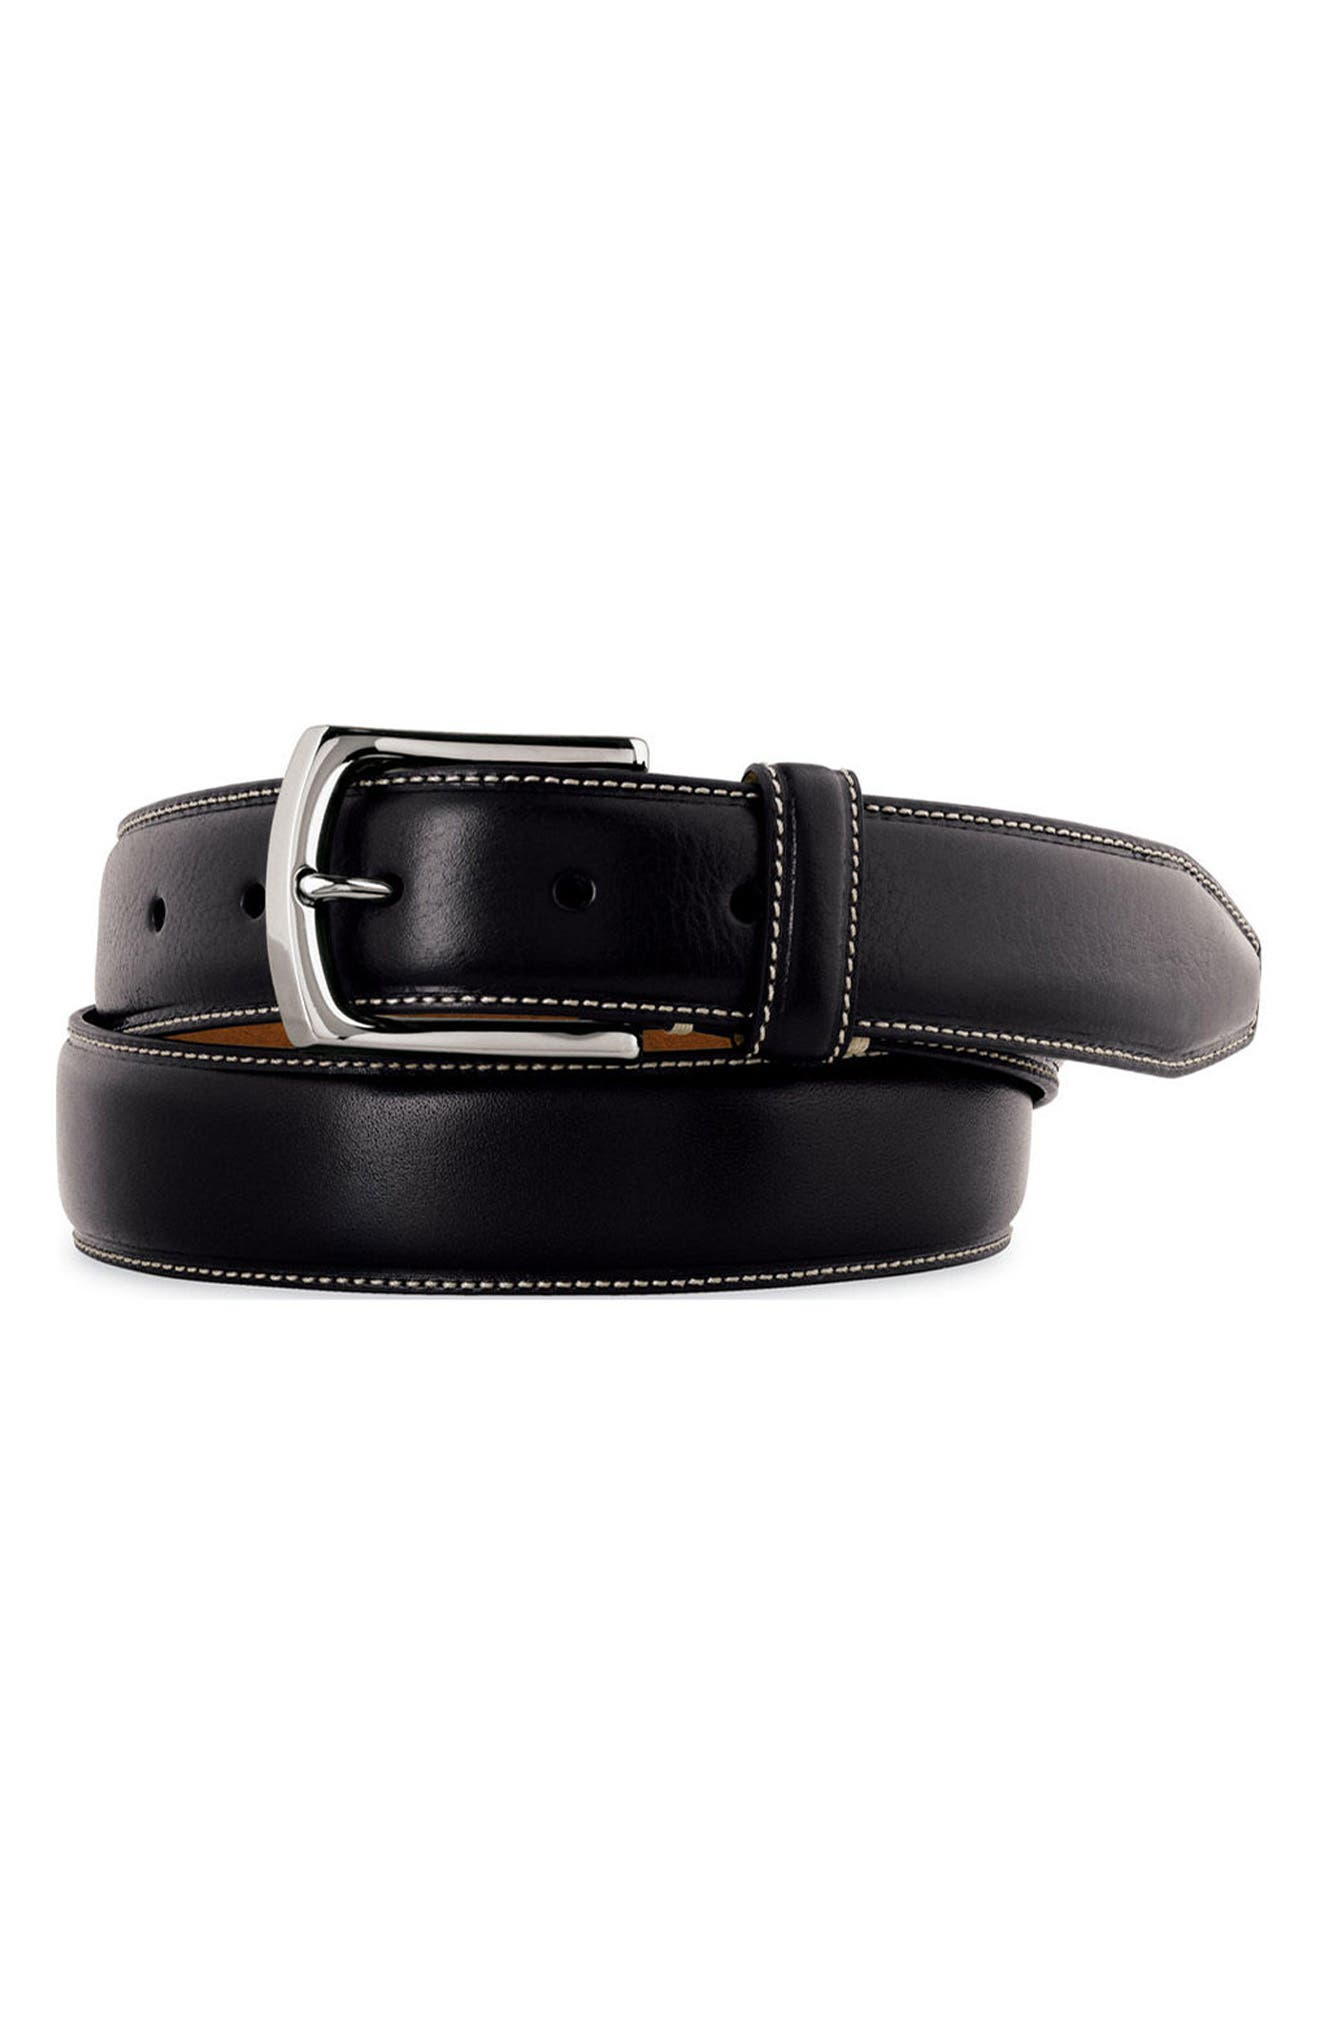 Johnston & Murphy Calfskin Leather Belt, Black